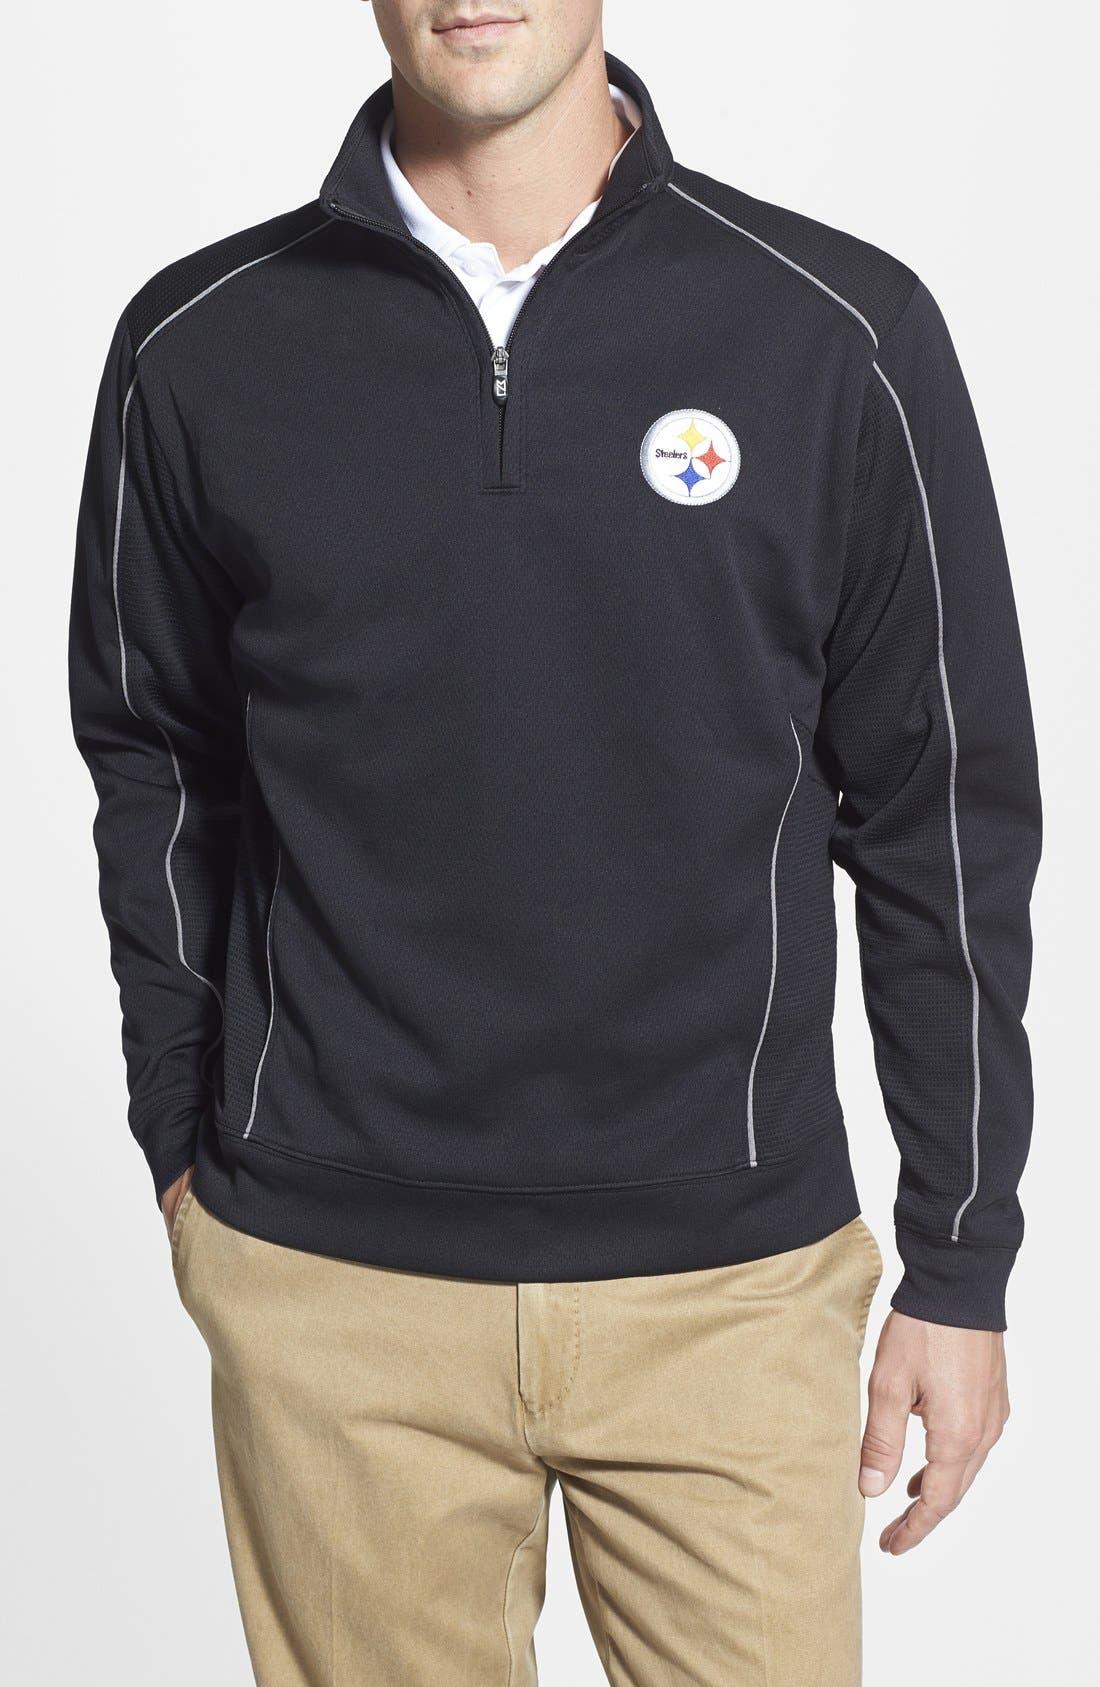 CUTTER & BUCK 'Pittsburgh Steelers - Edge' DryTec